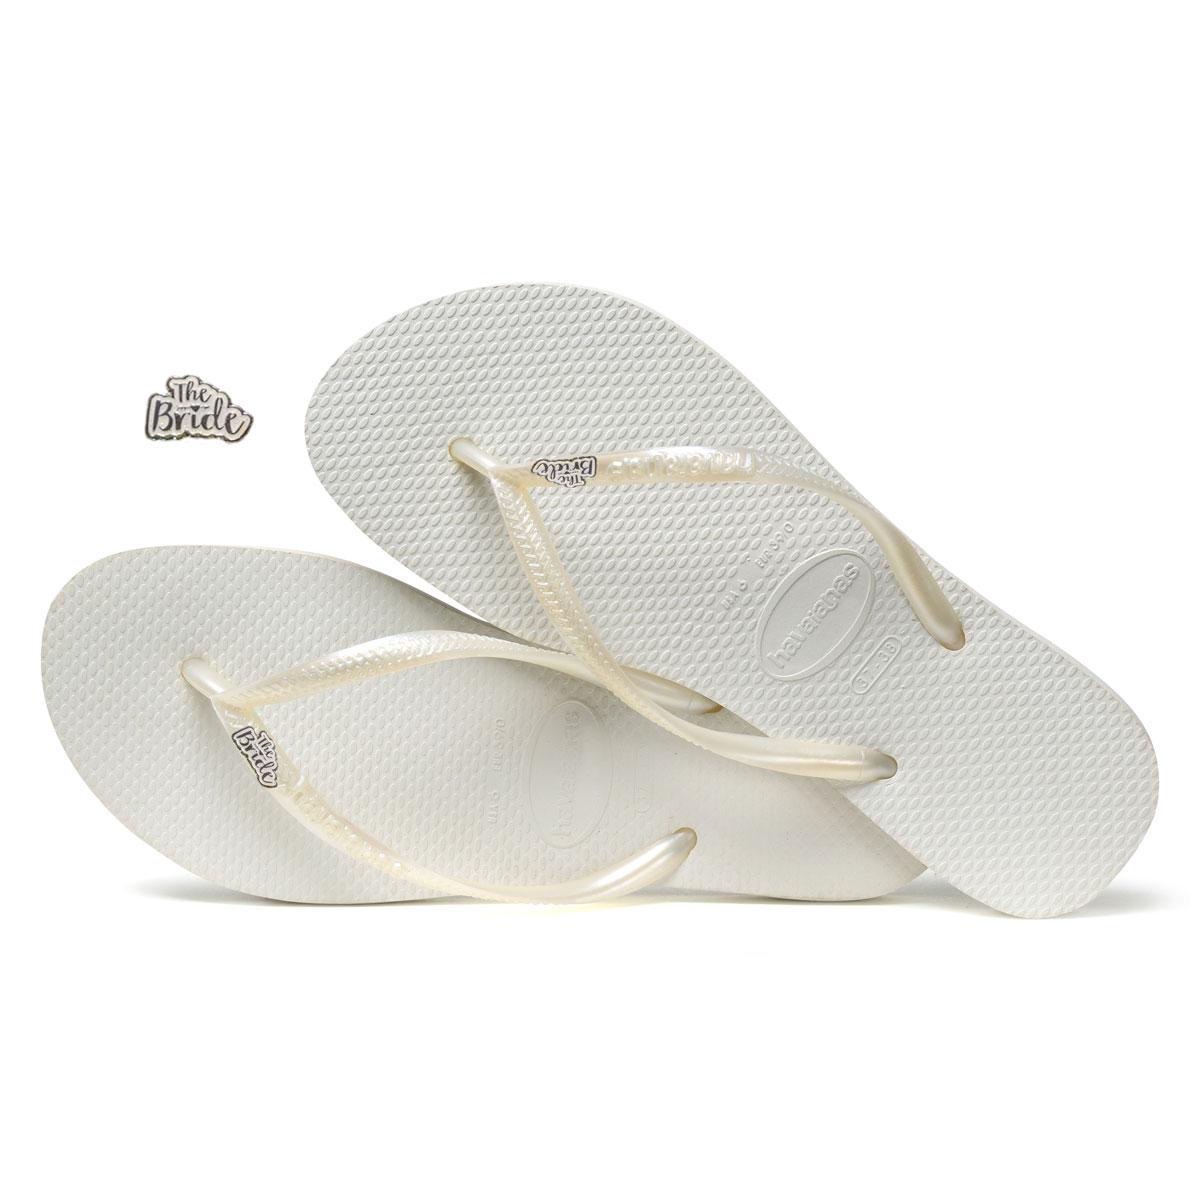 Havaianas Slim White Flip-Flops with 'The Bride' Charm Wedding